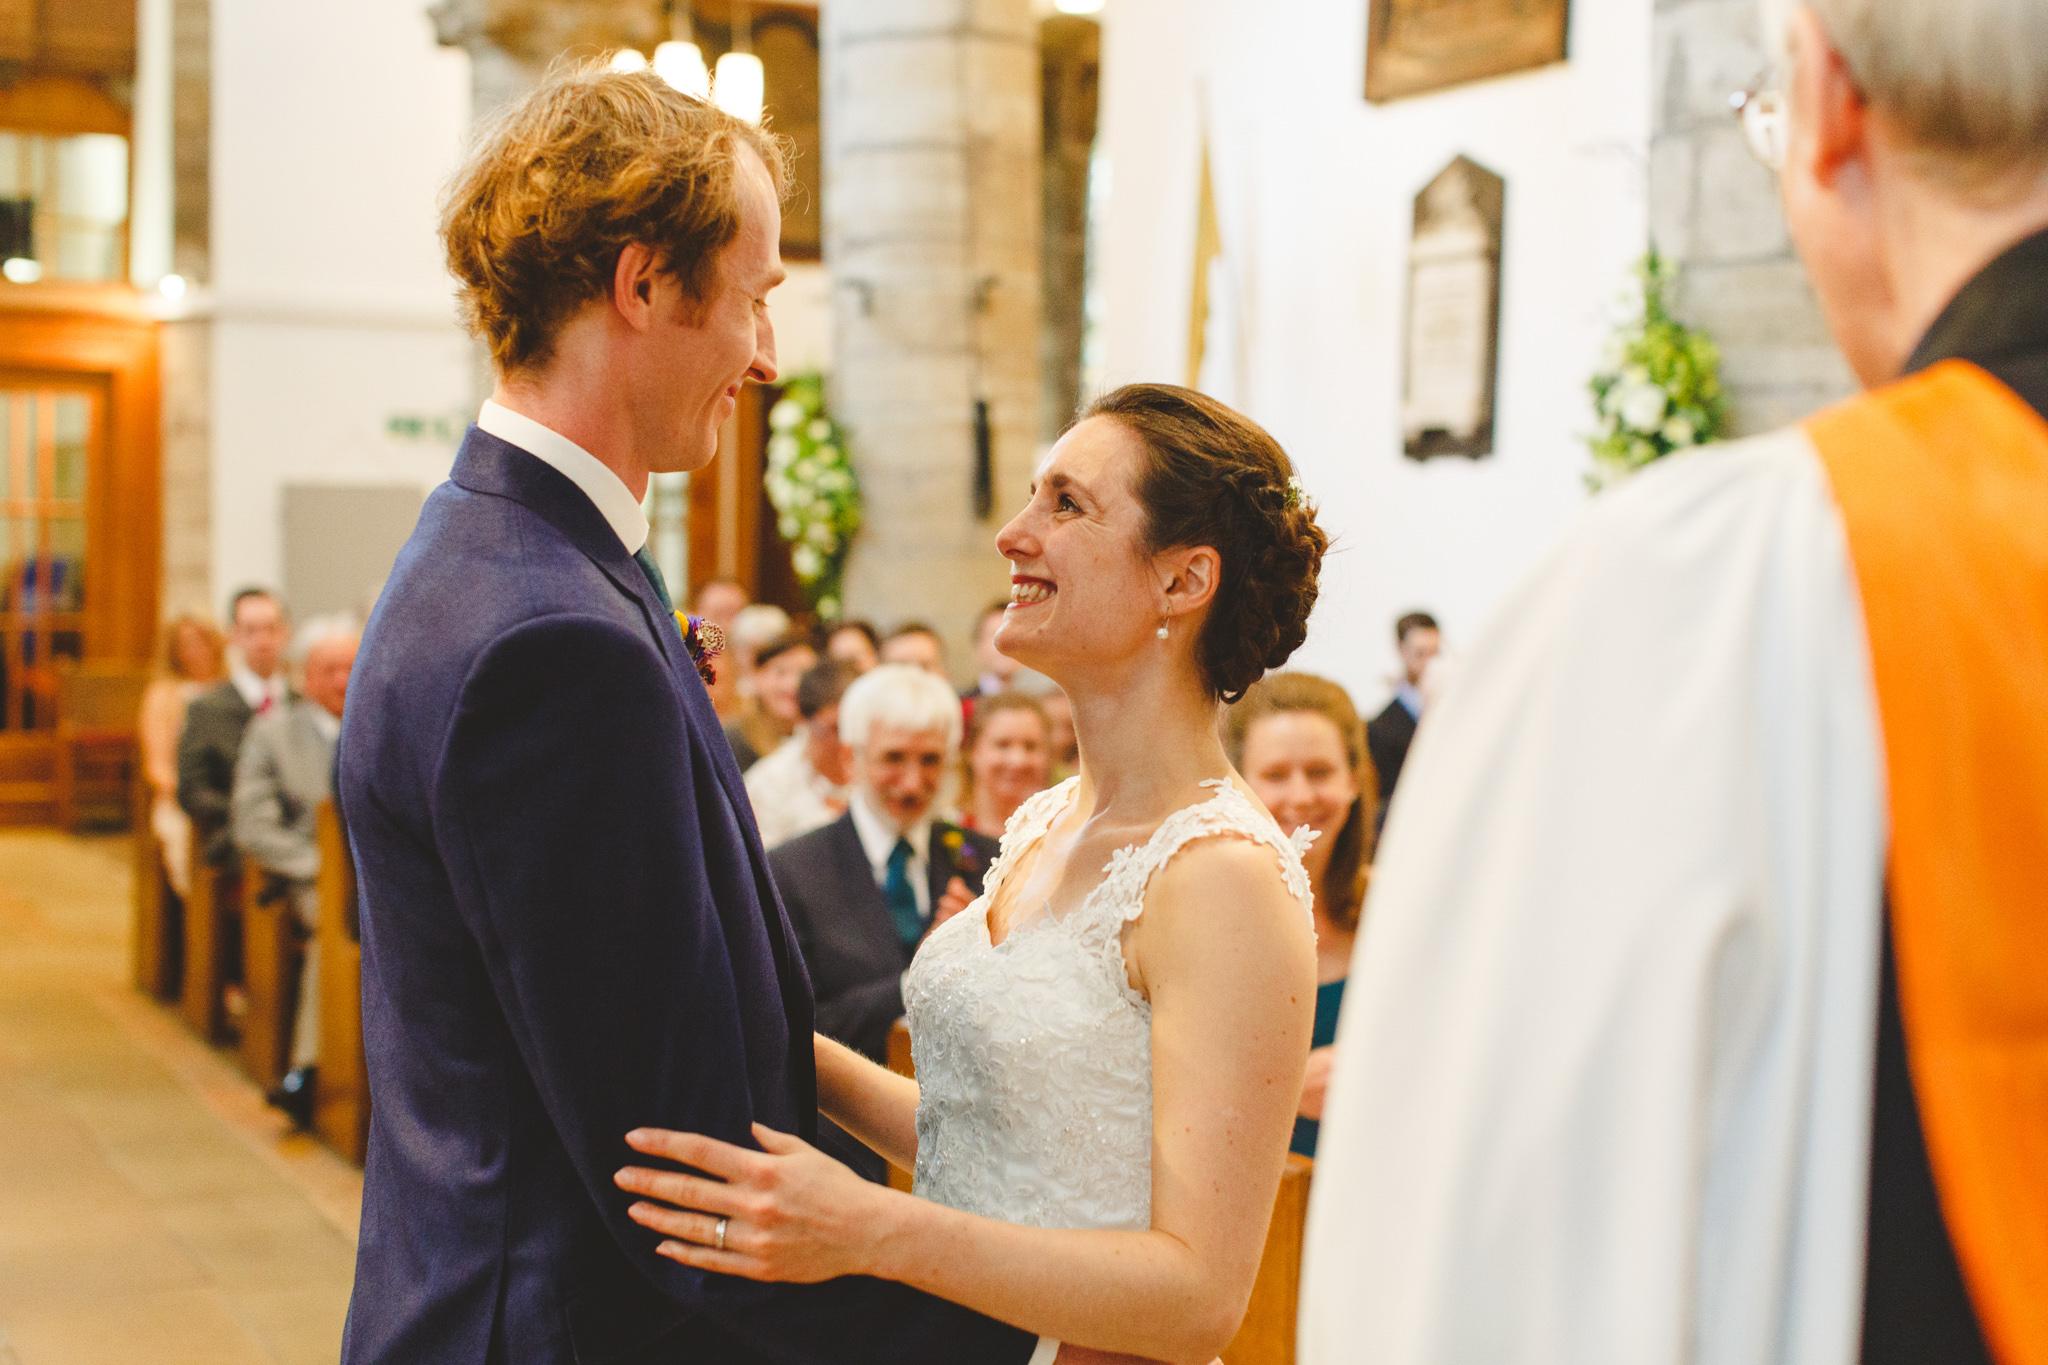 derbyshire-wedding-photographer-videographer-camera-hannah-51.jpg